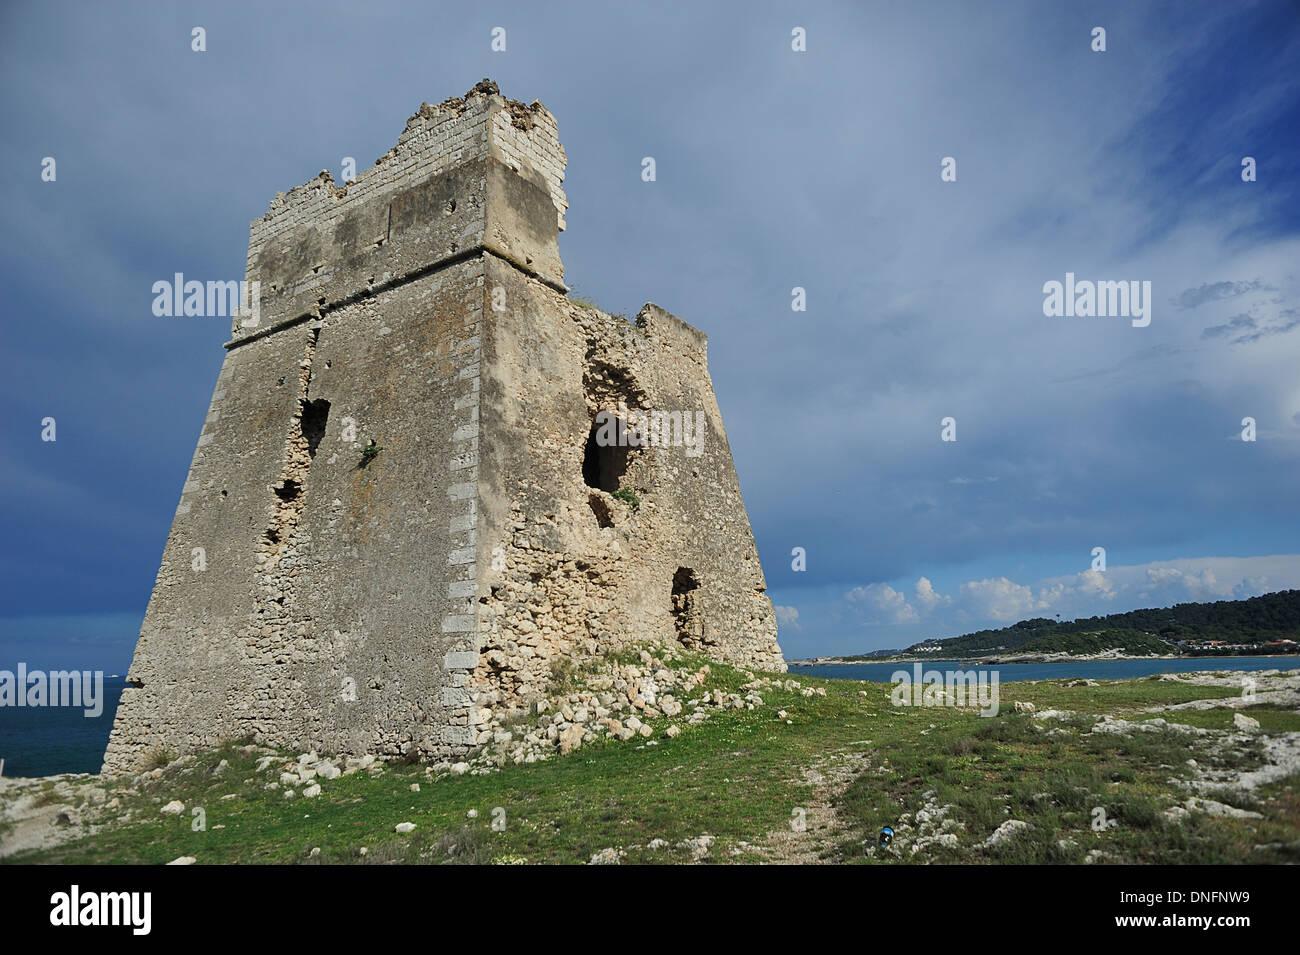 Sfinale Lookout tower, Peschici sul Gargano, Gargano National Park, Foggia, Puglia, Italy - Stock Image